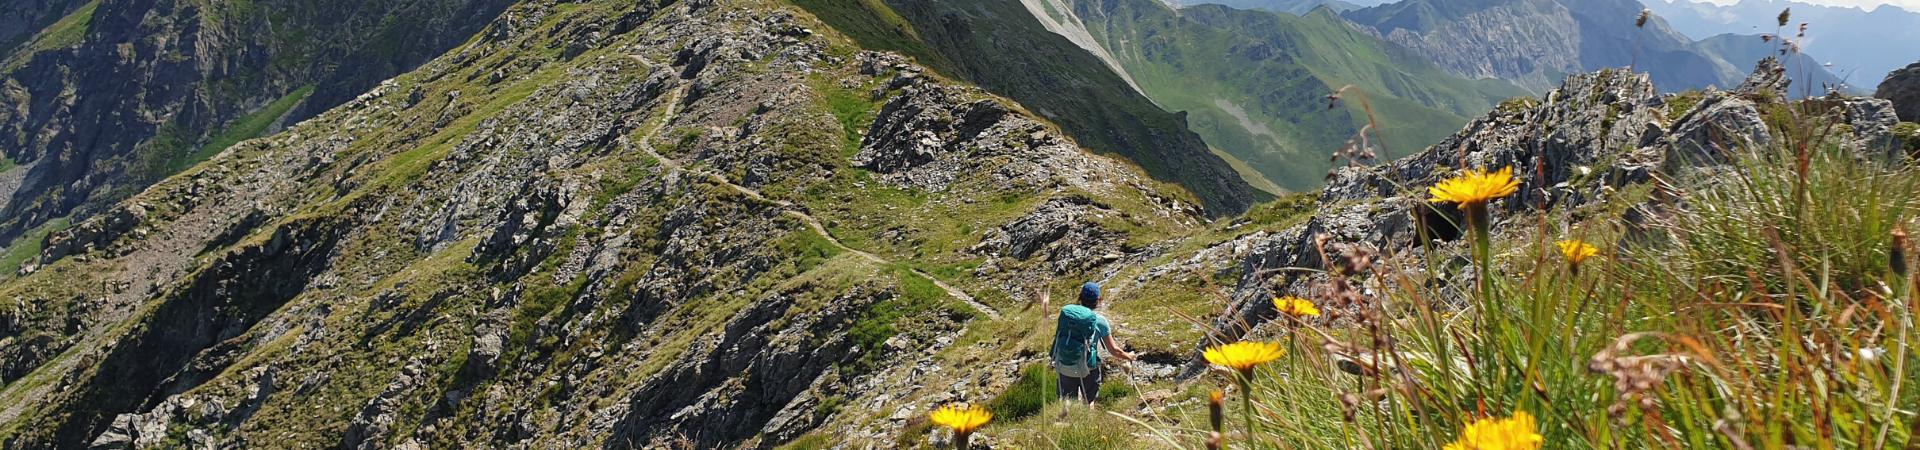 Dare Greatly Experiences | Karnische Hoehenweg, Austria